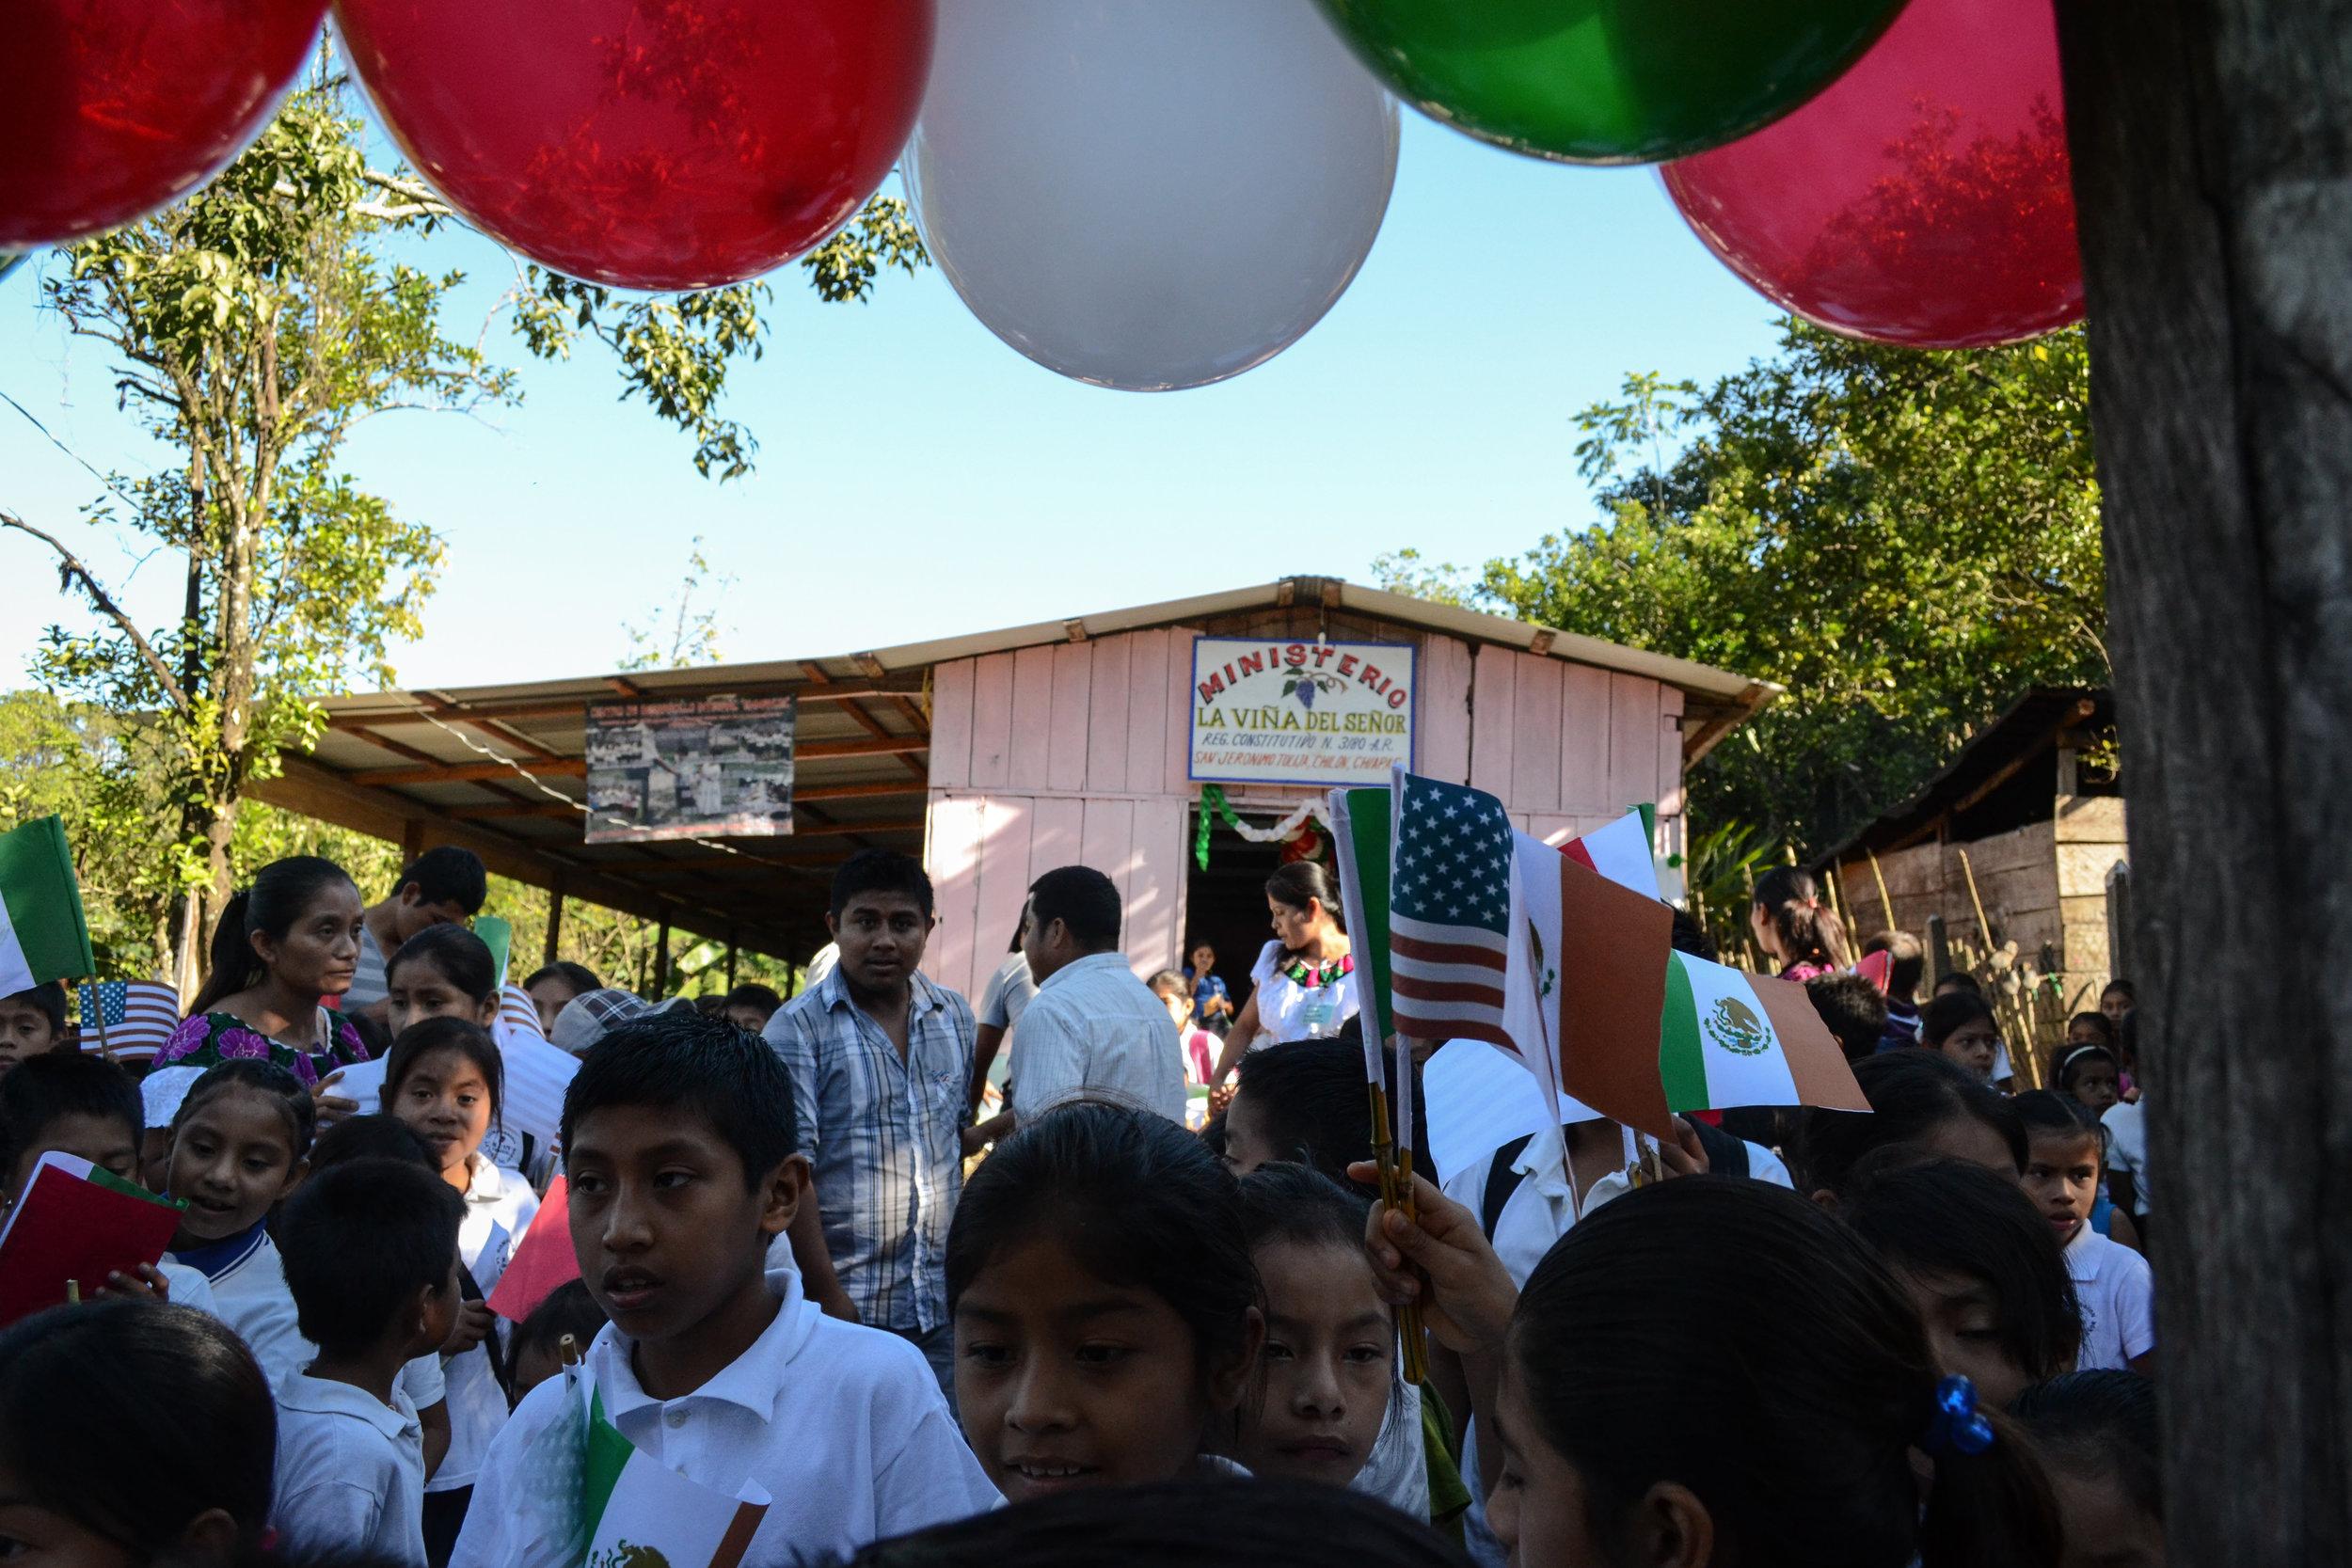 Compassion church partner in Chiapas